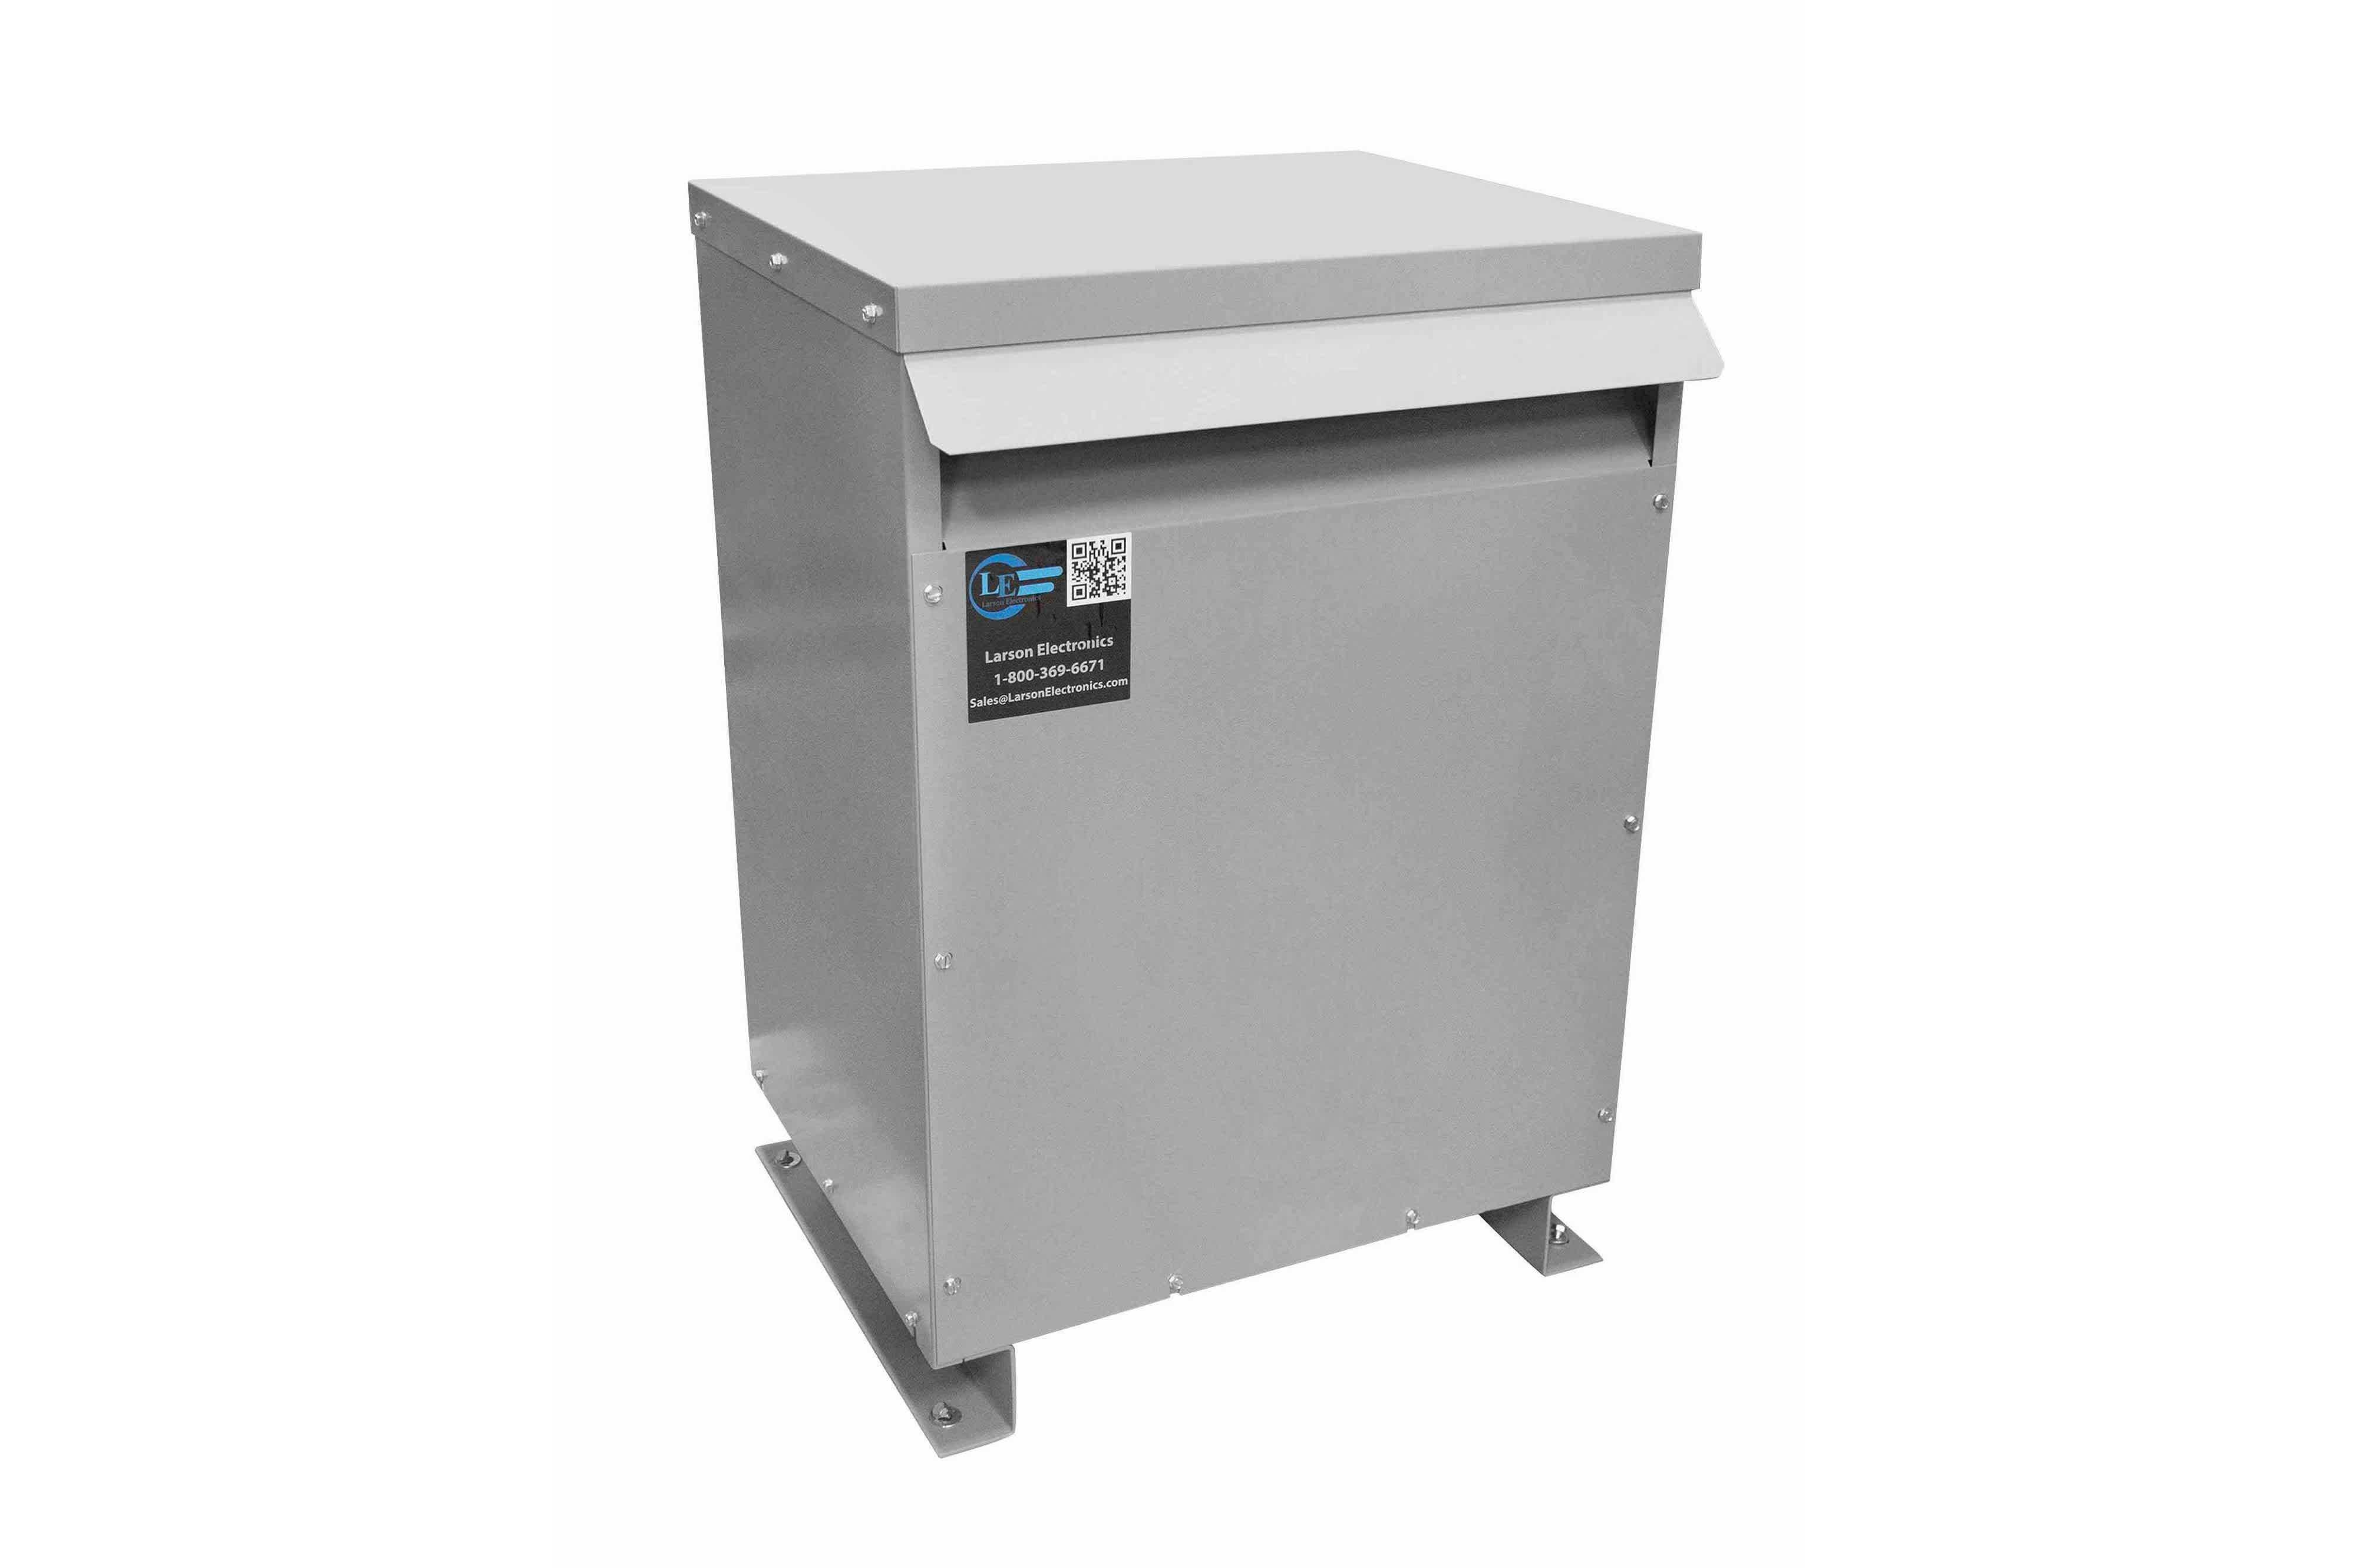 12 kVA 3PH Isolation Transformer, 415V Wye Primary, 480V Delta Secondary, N3R, Ventilated, 60 Hz